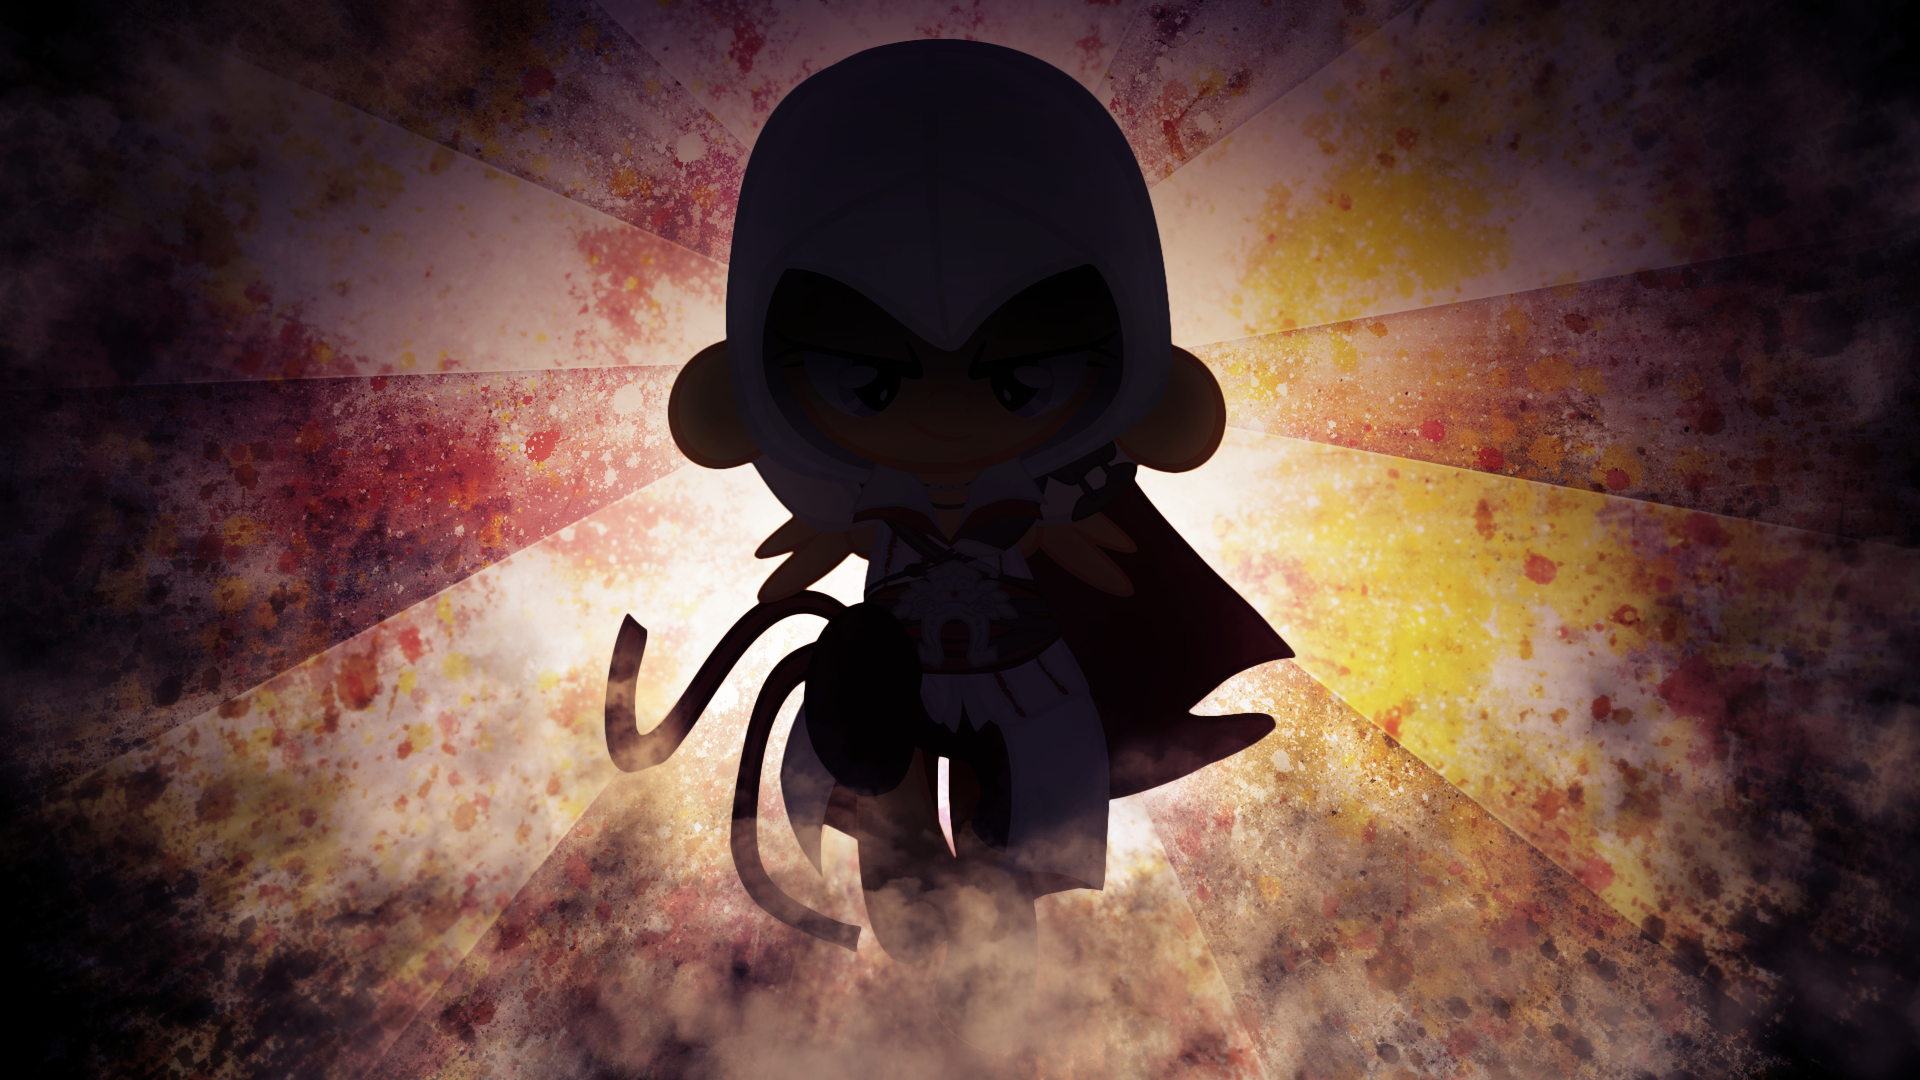 Ezio Scootatore by NadiaRodriguez and SandwichDelta